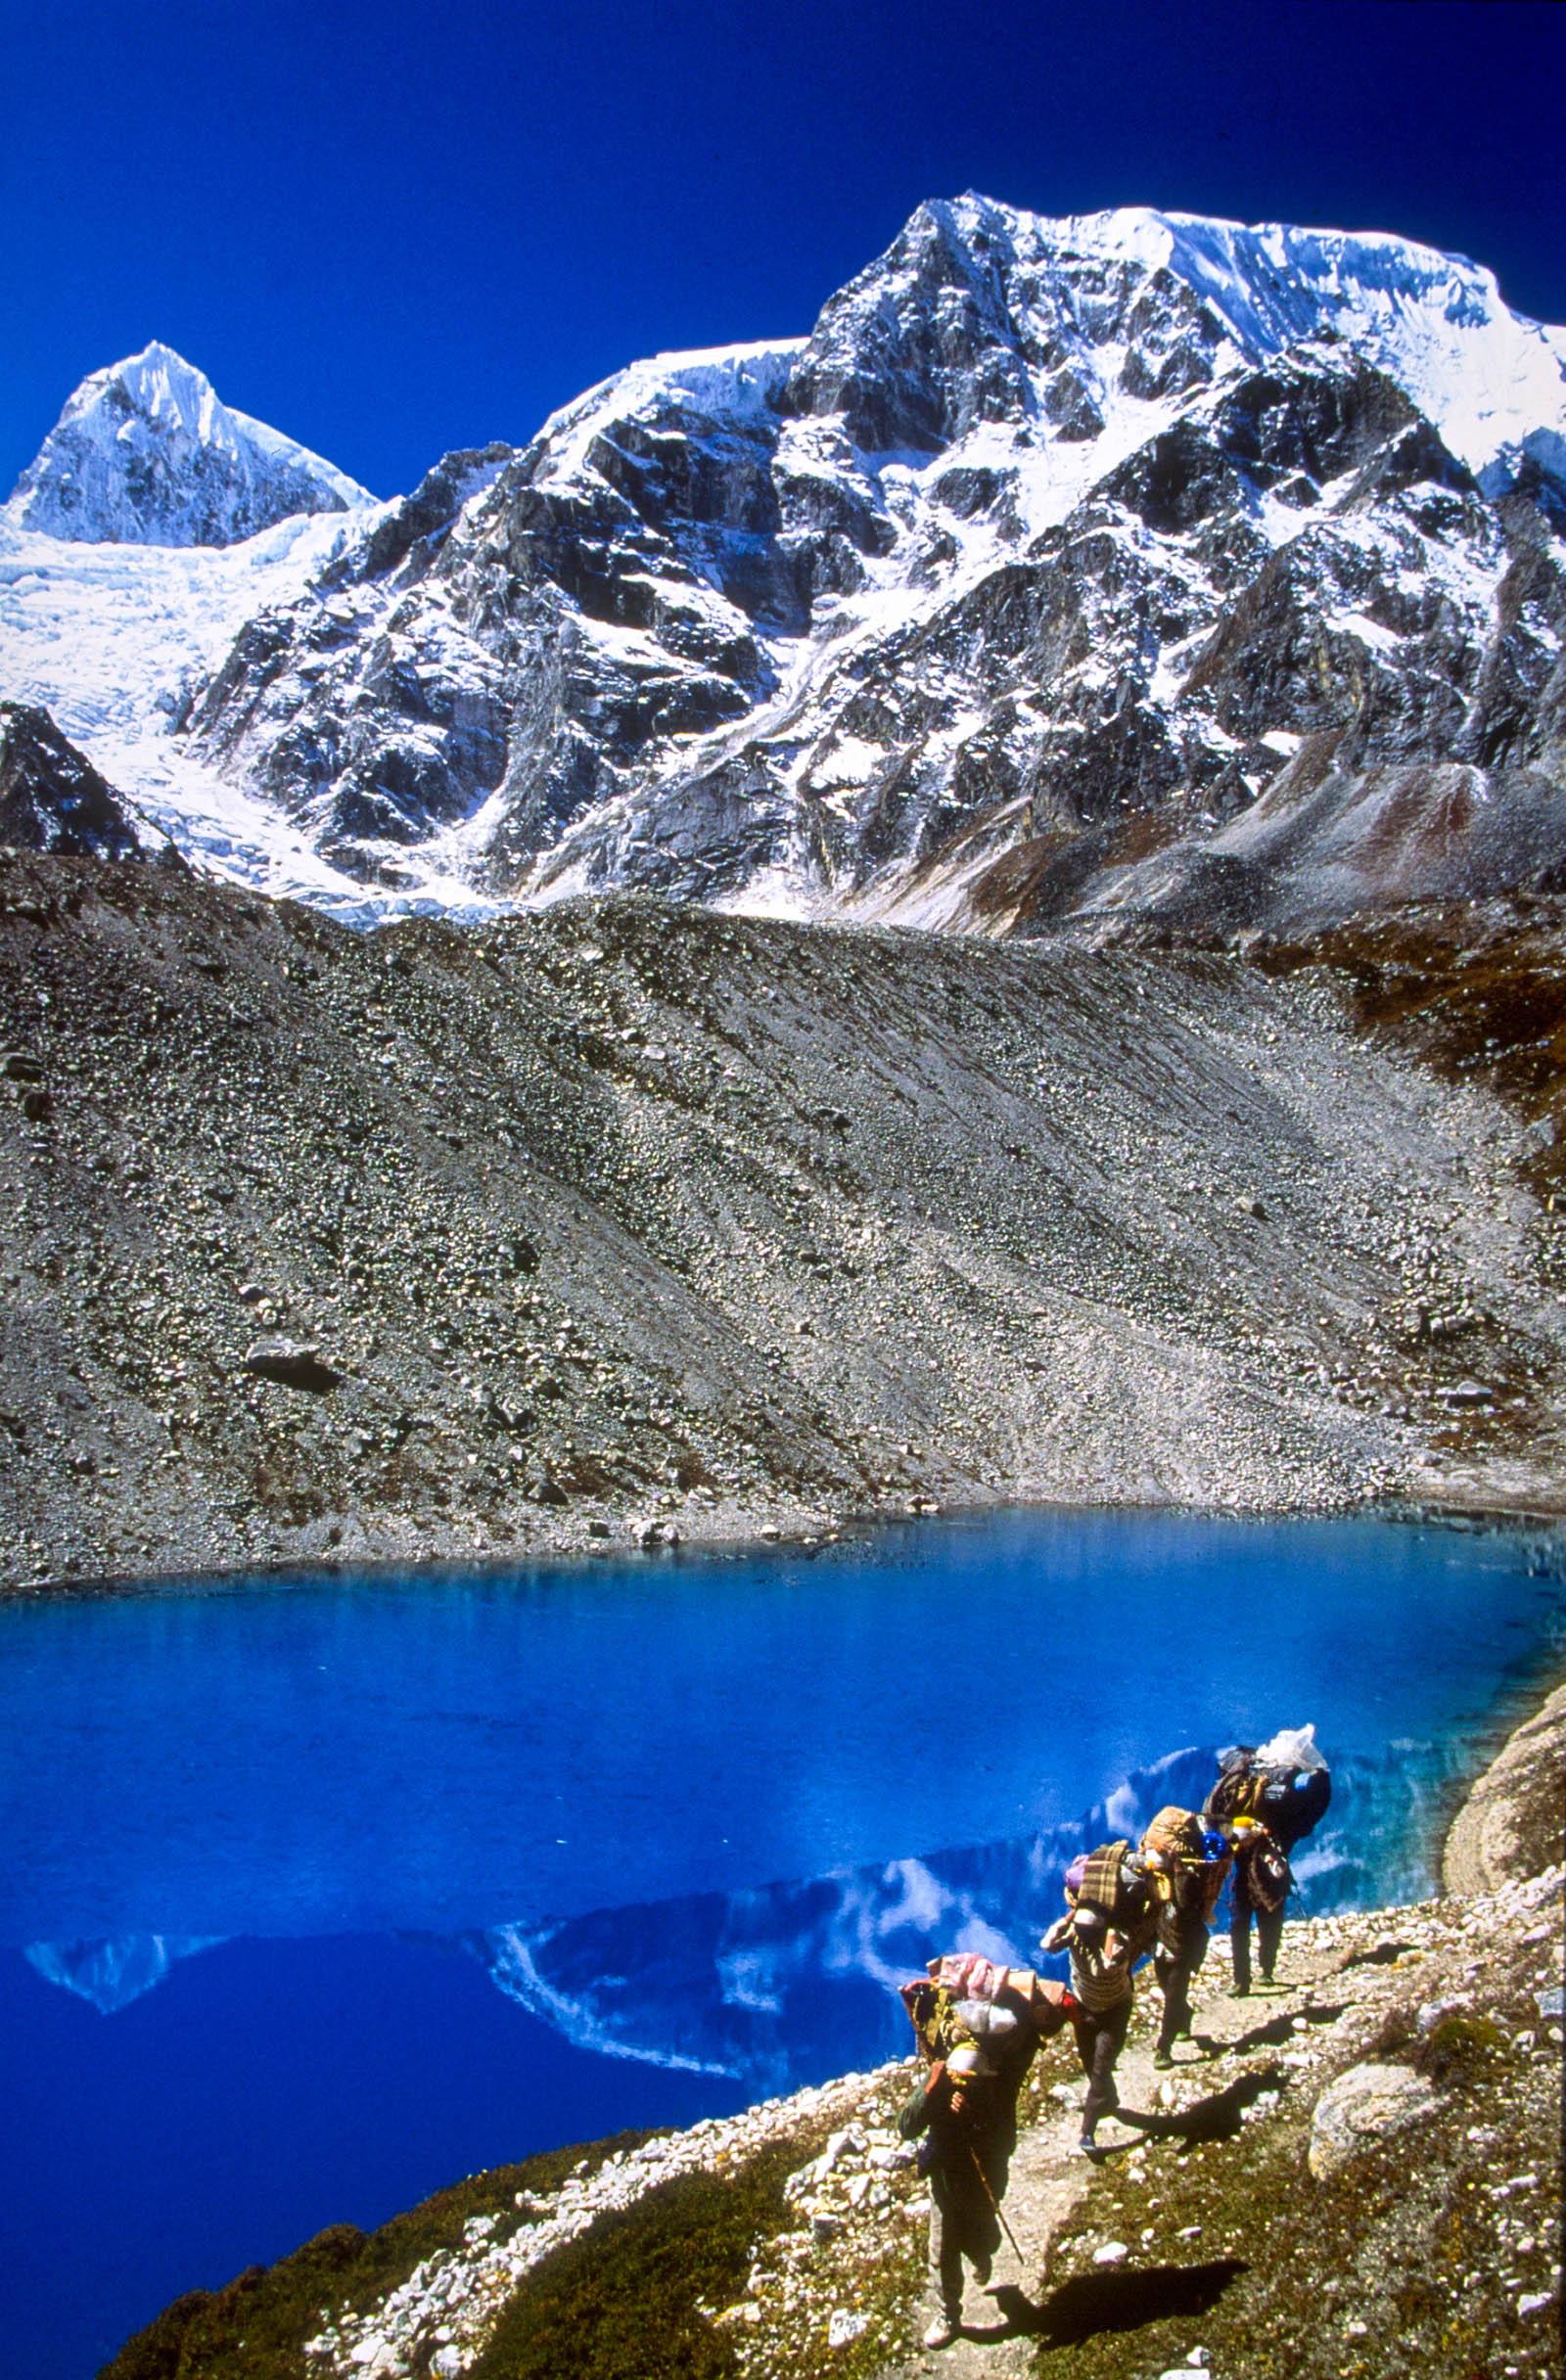 Porters walk along lakeside trail, Pang Phuchi mountain behind, east side of Larkya La (5135m), Manaslu area. Nepal. 1996.